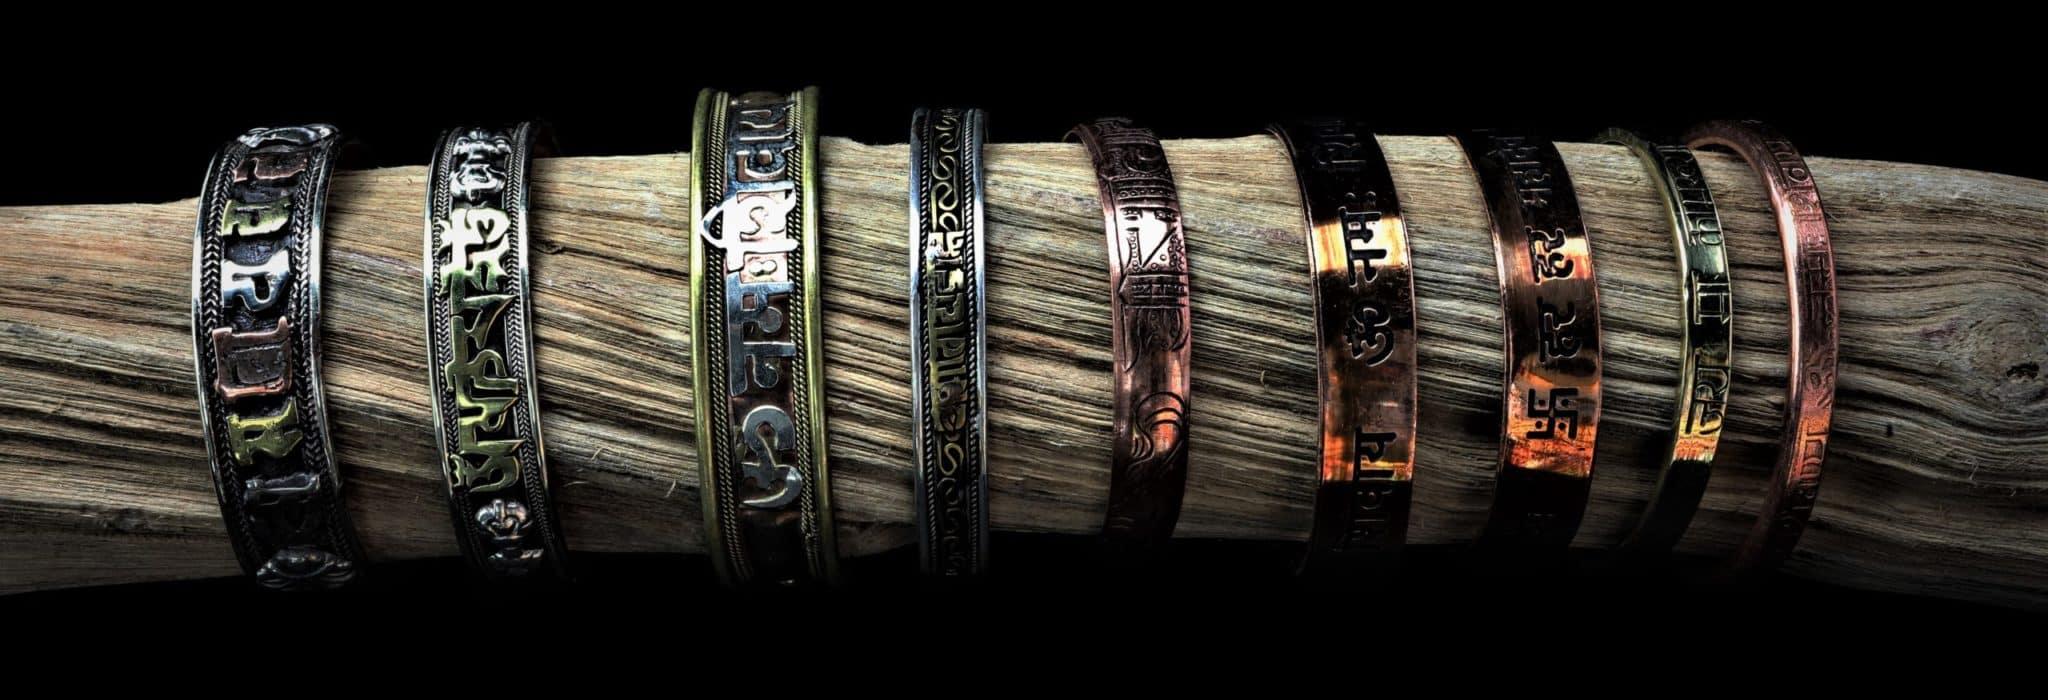 bracelet ayurvédique tibétain mantra